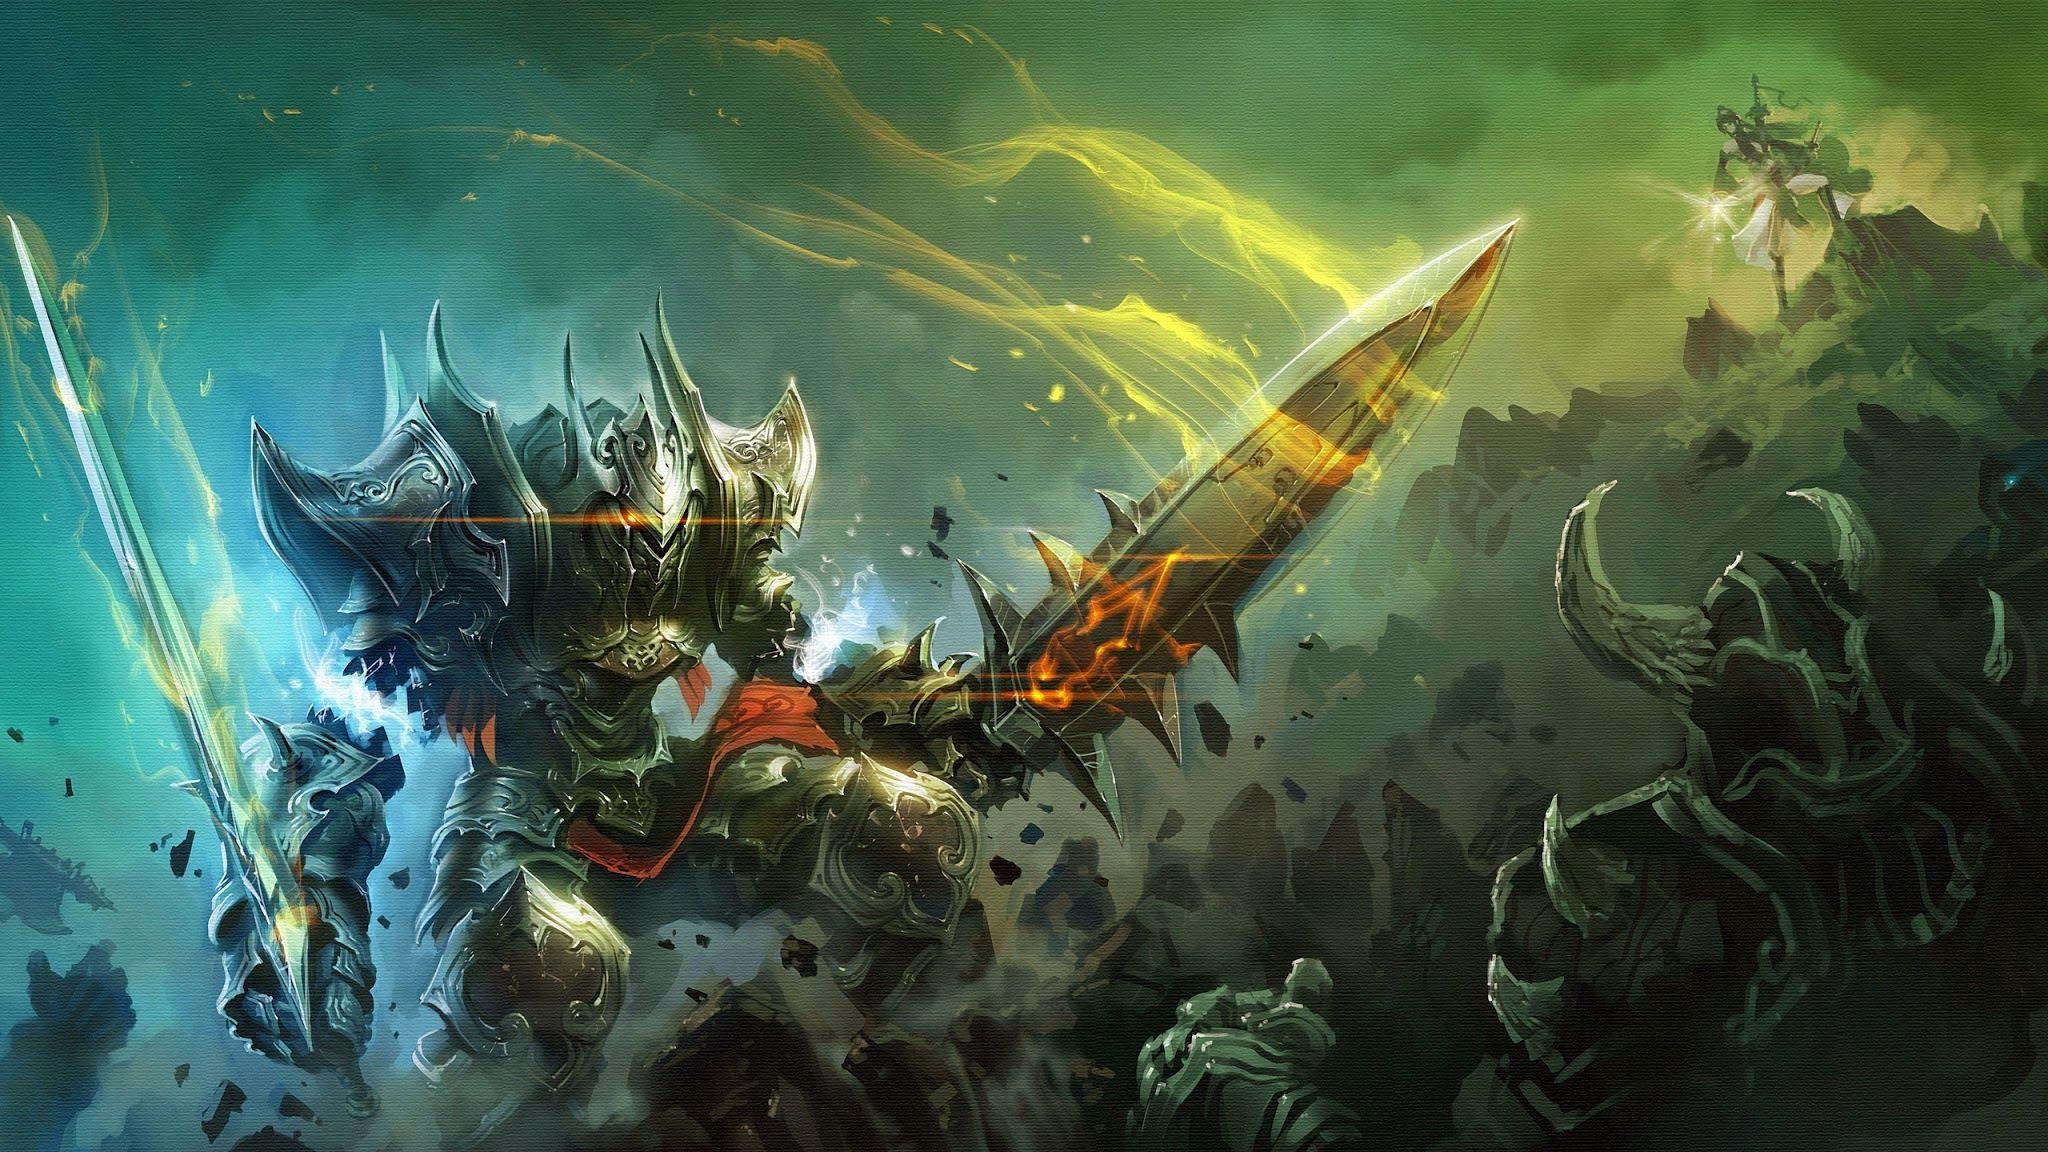 Epic Battle Fantasy Wallpaper Battle Warriors Knight Epic Weapon Armor Sword Fantasy Wallpaper404 Com Hd Zojuar Jpg Scifi Fantasy Art Epic Backgrounds Fantasy